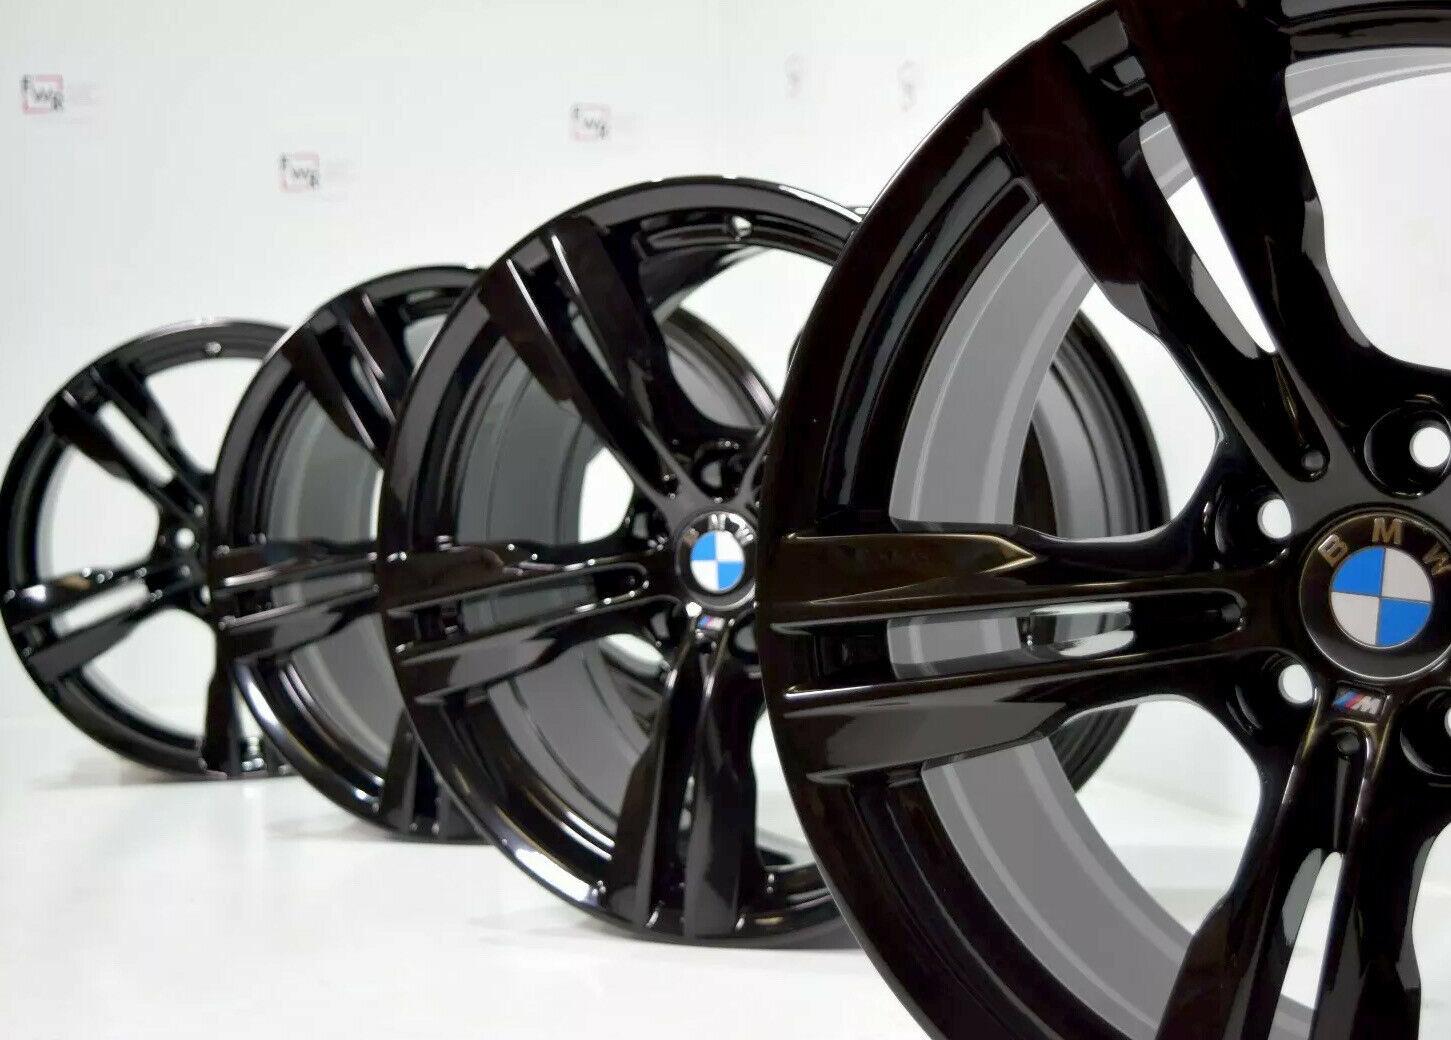 19 Bmw X5 467 M Sport Black Factory Oem Rims 19 9 860043 Fits 2007 2018 X5 X6 Factory Wheel Republic